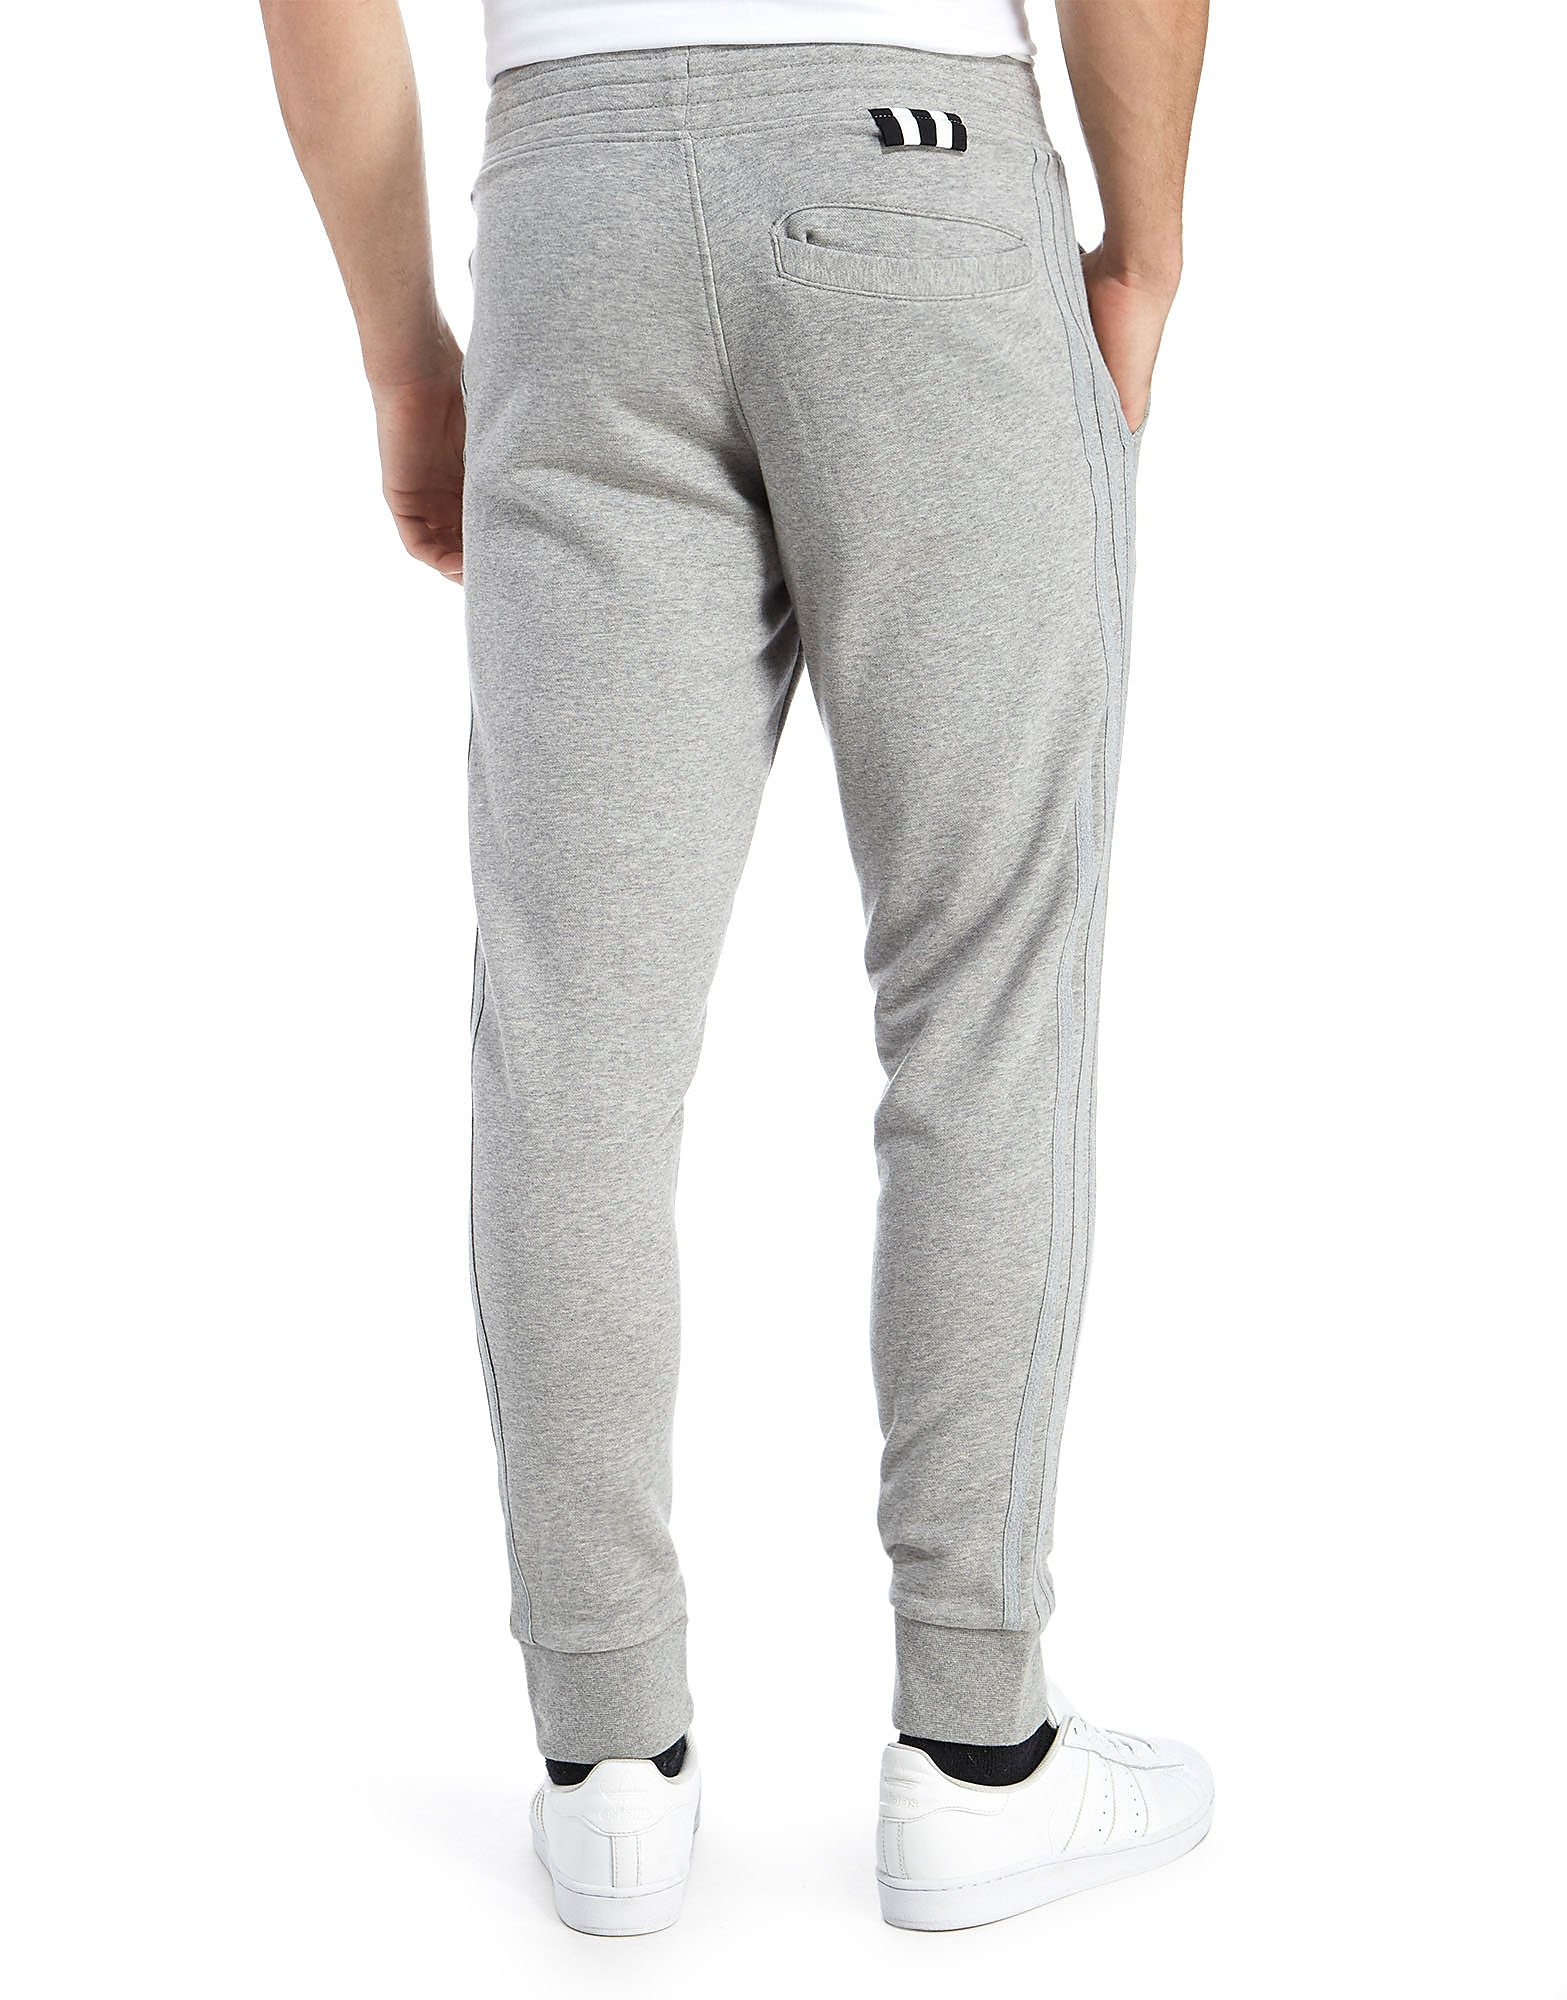 adidas Originals Cuffed Sweat Pants